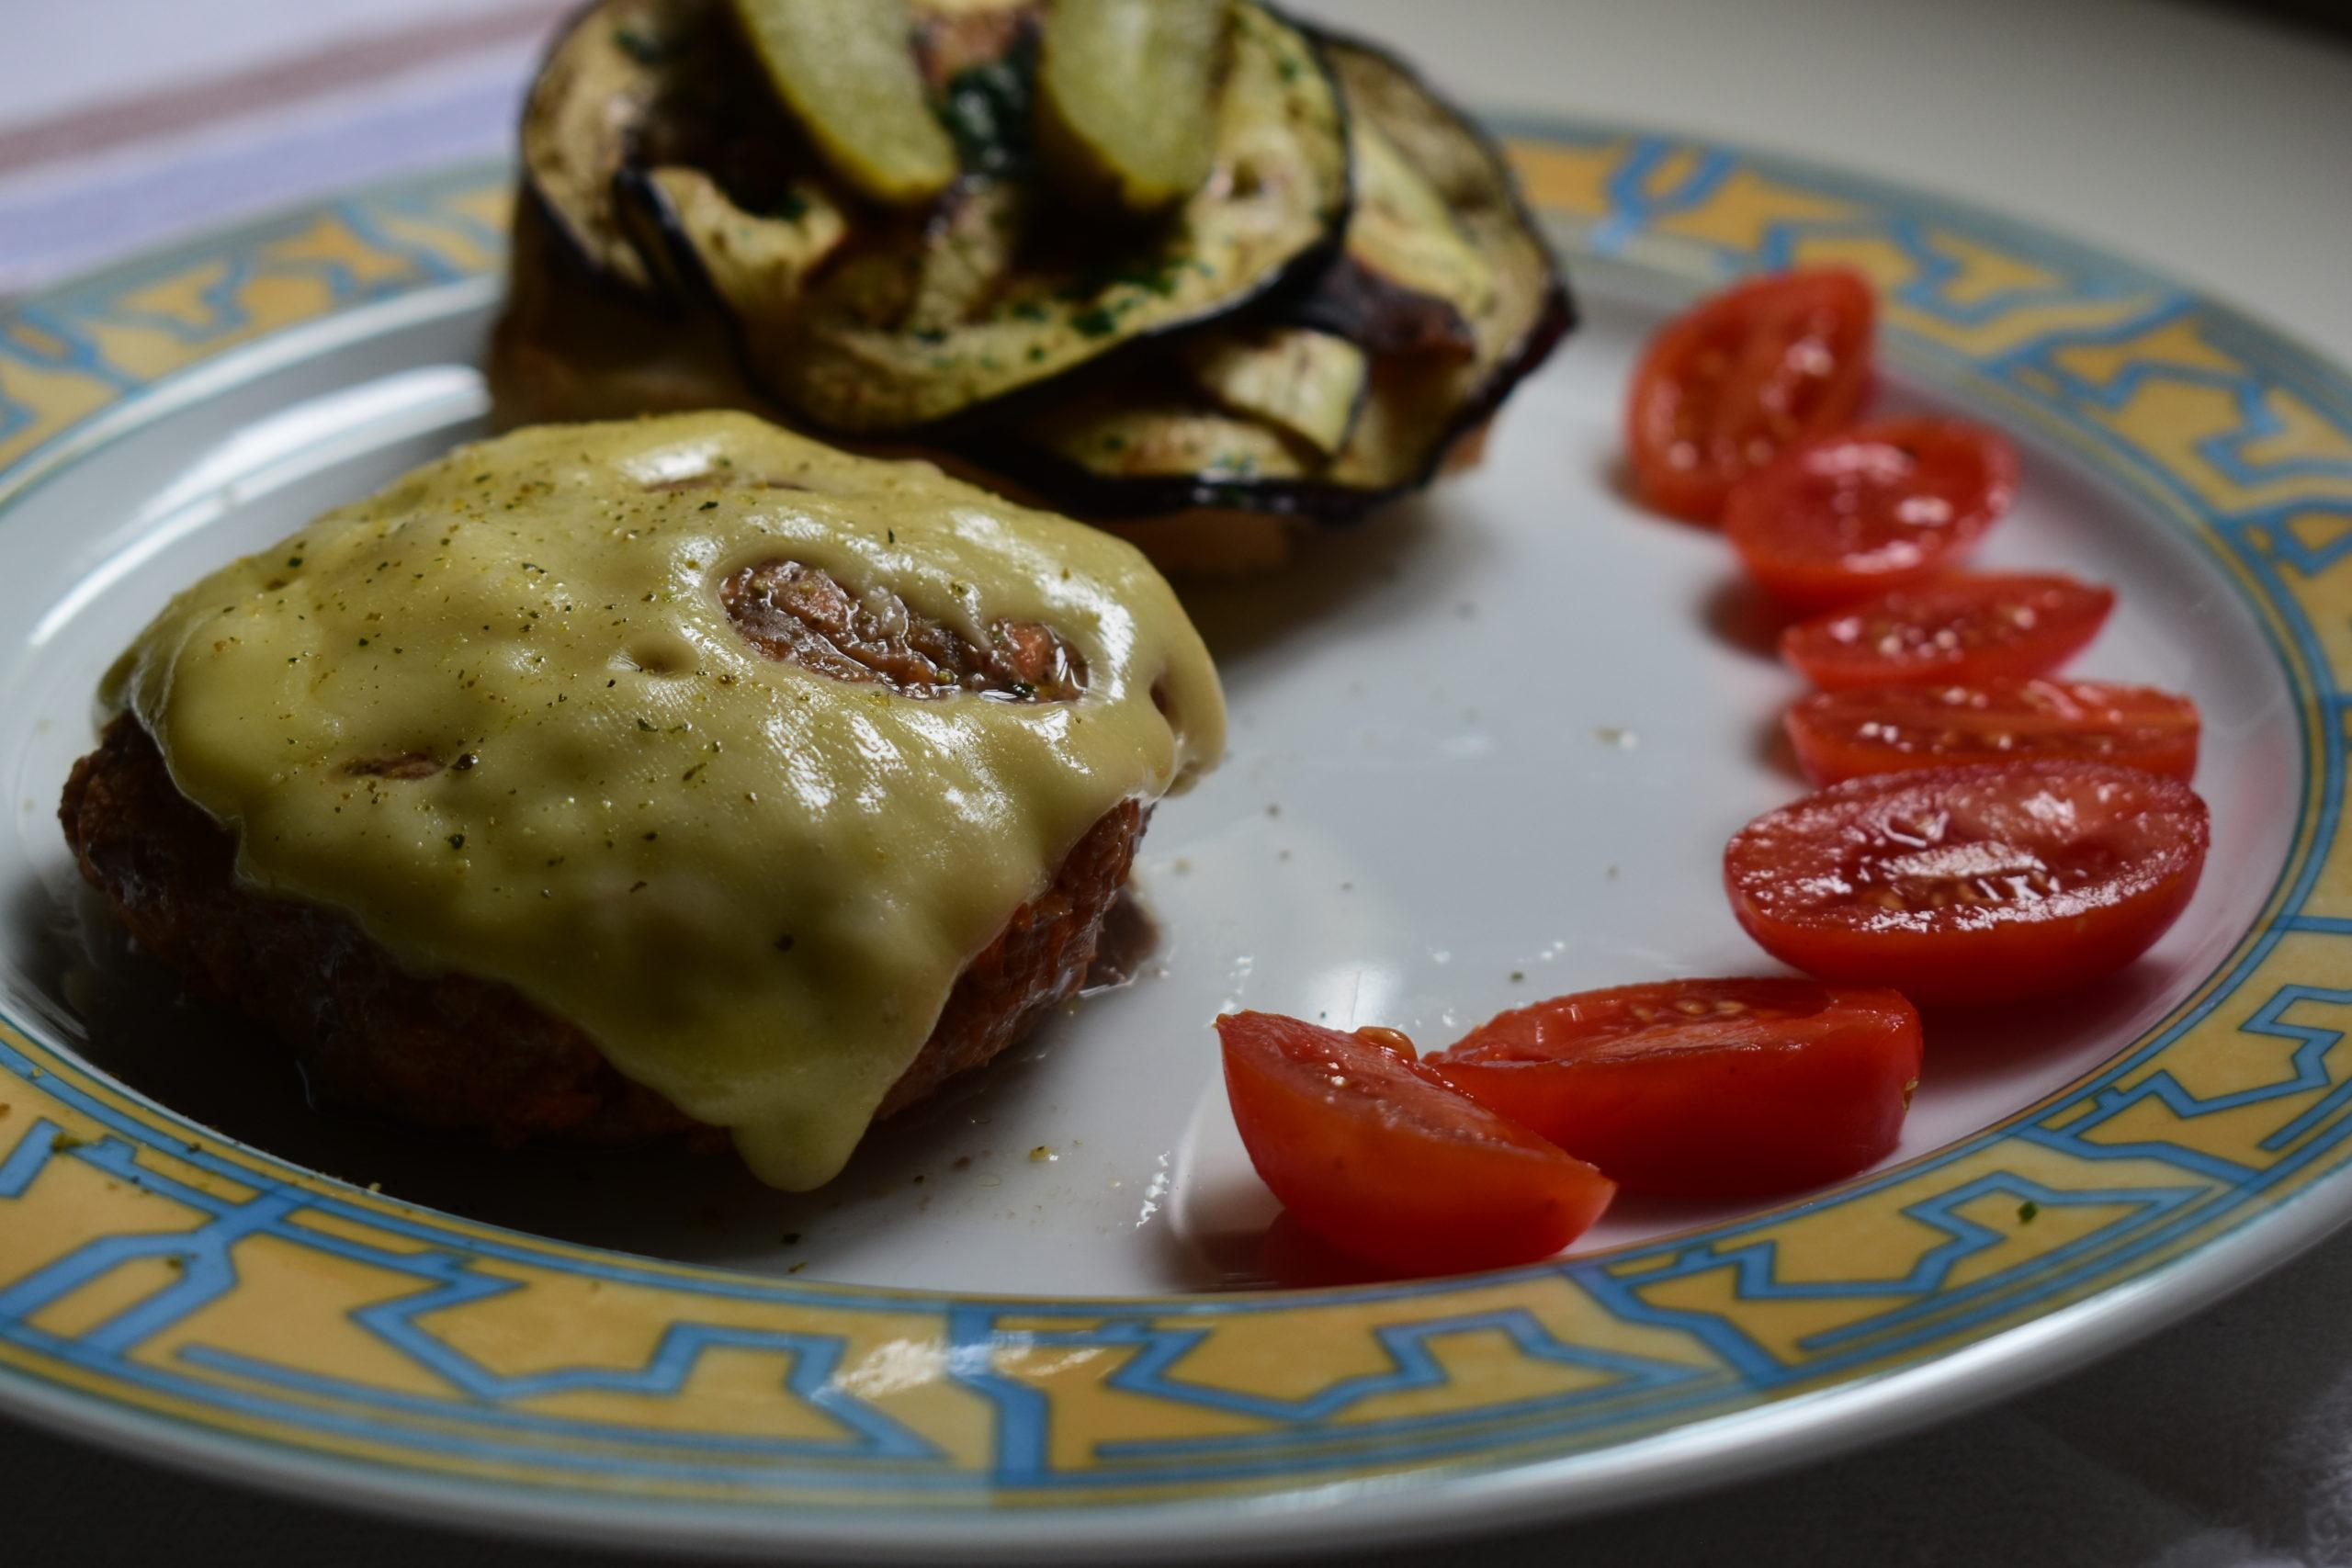 Oven baked juicy burgers